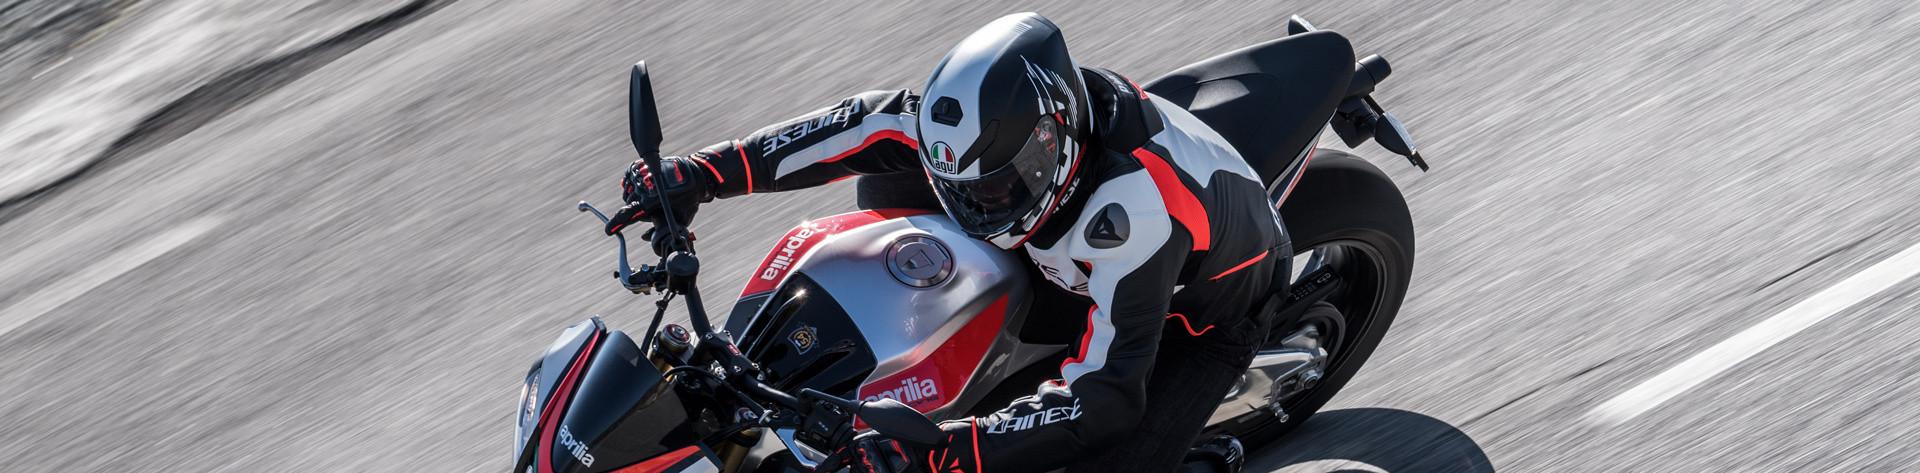 Full Face Helmets K 5 S Agv Motorcycle Helmets Official Website